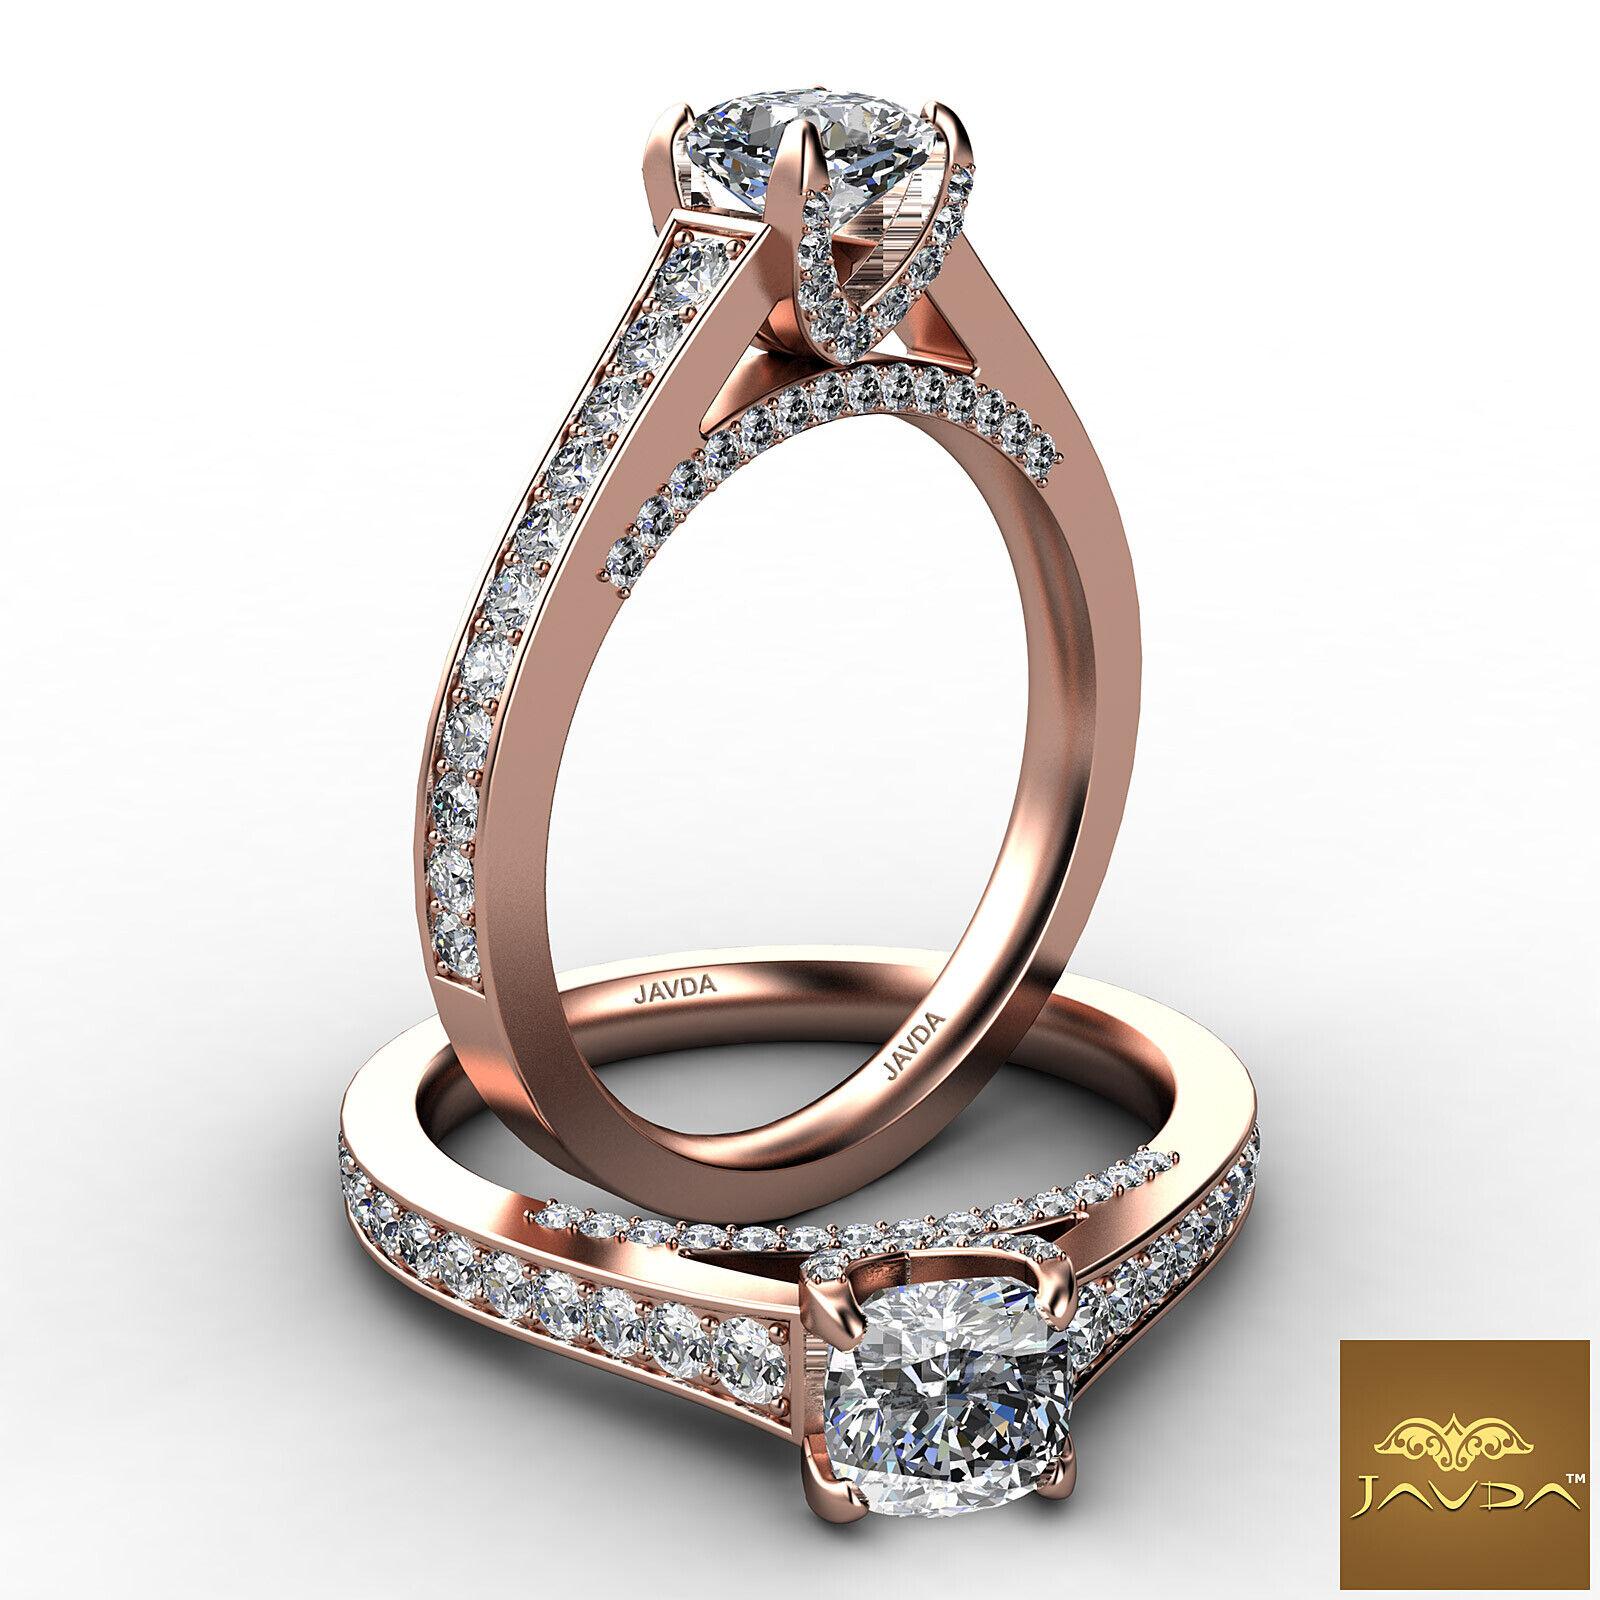 Cushion Cut Diamond Flawless Engagement GIA G VVS2 Pave Set Ring Platinum 1.25Ct 8